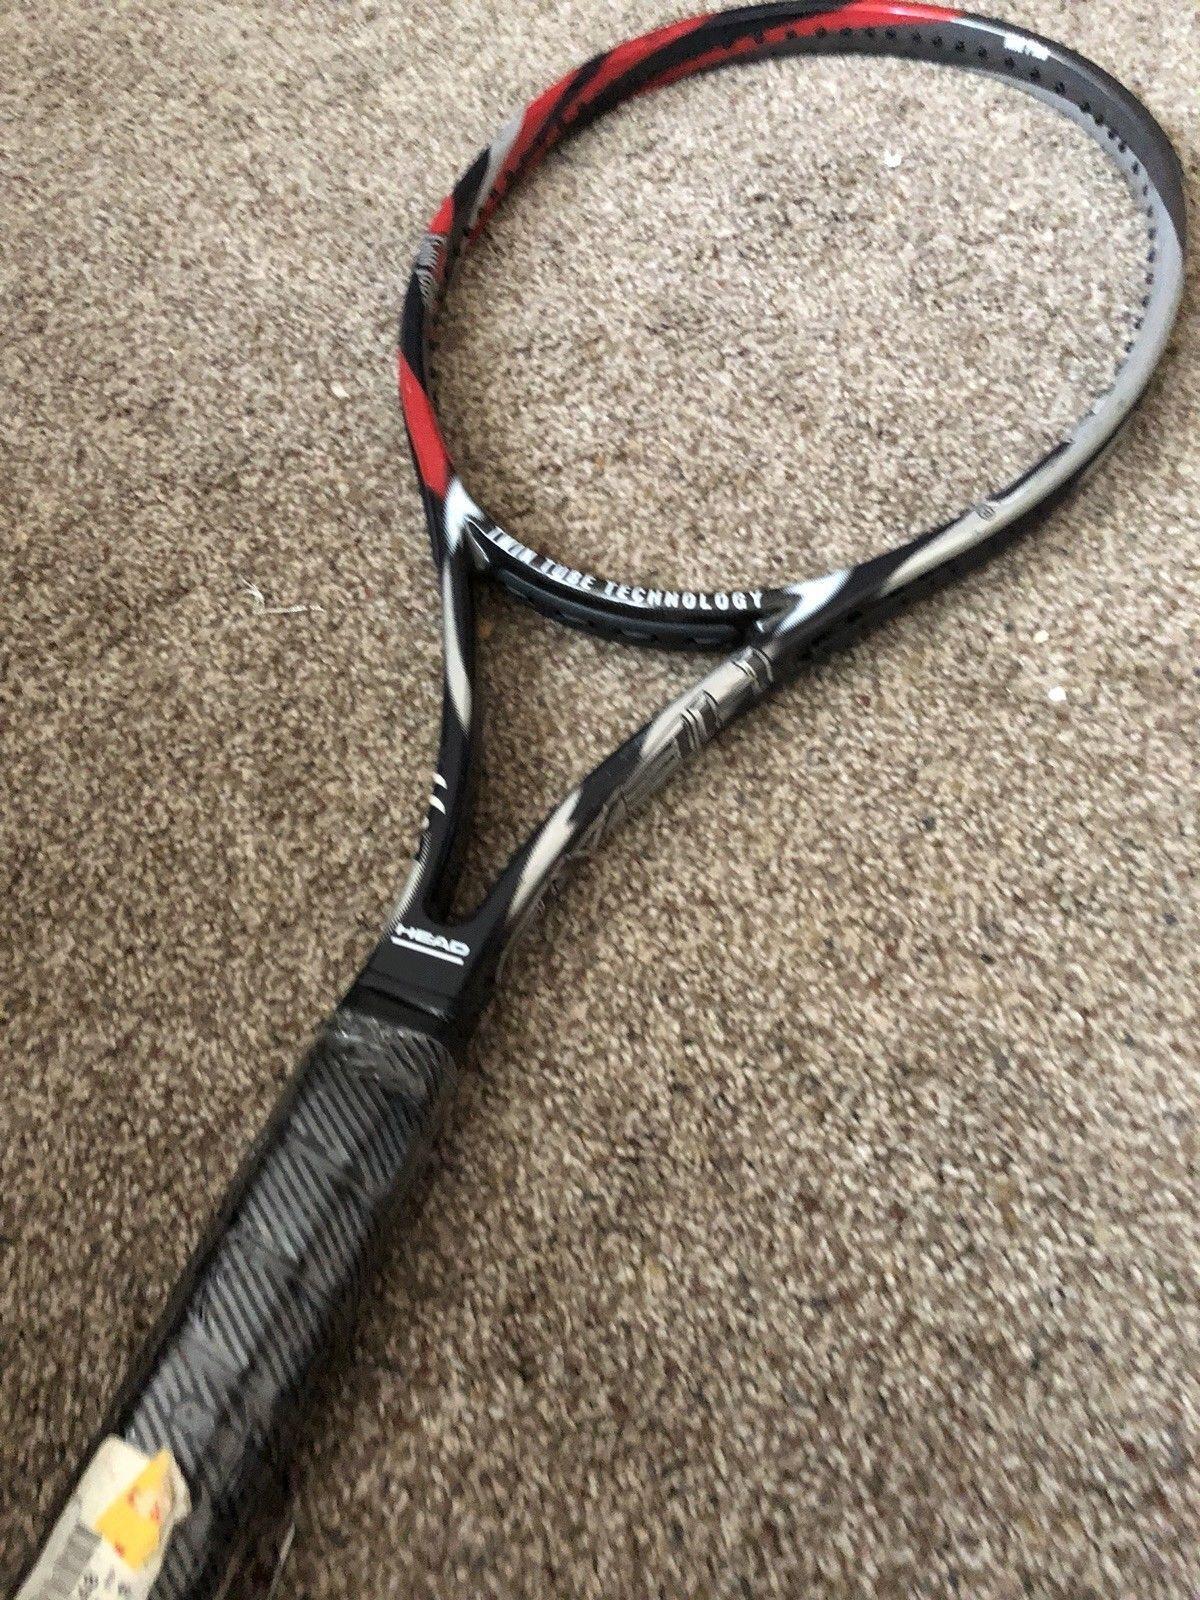 New Head Satellite Tour Midplus 102 head 4 1 2 grip Austria Tennis Racquet